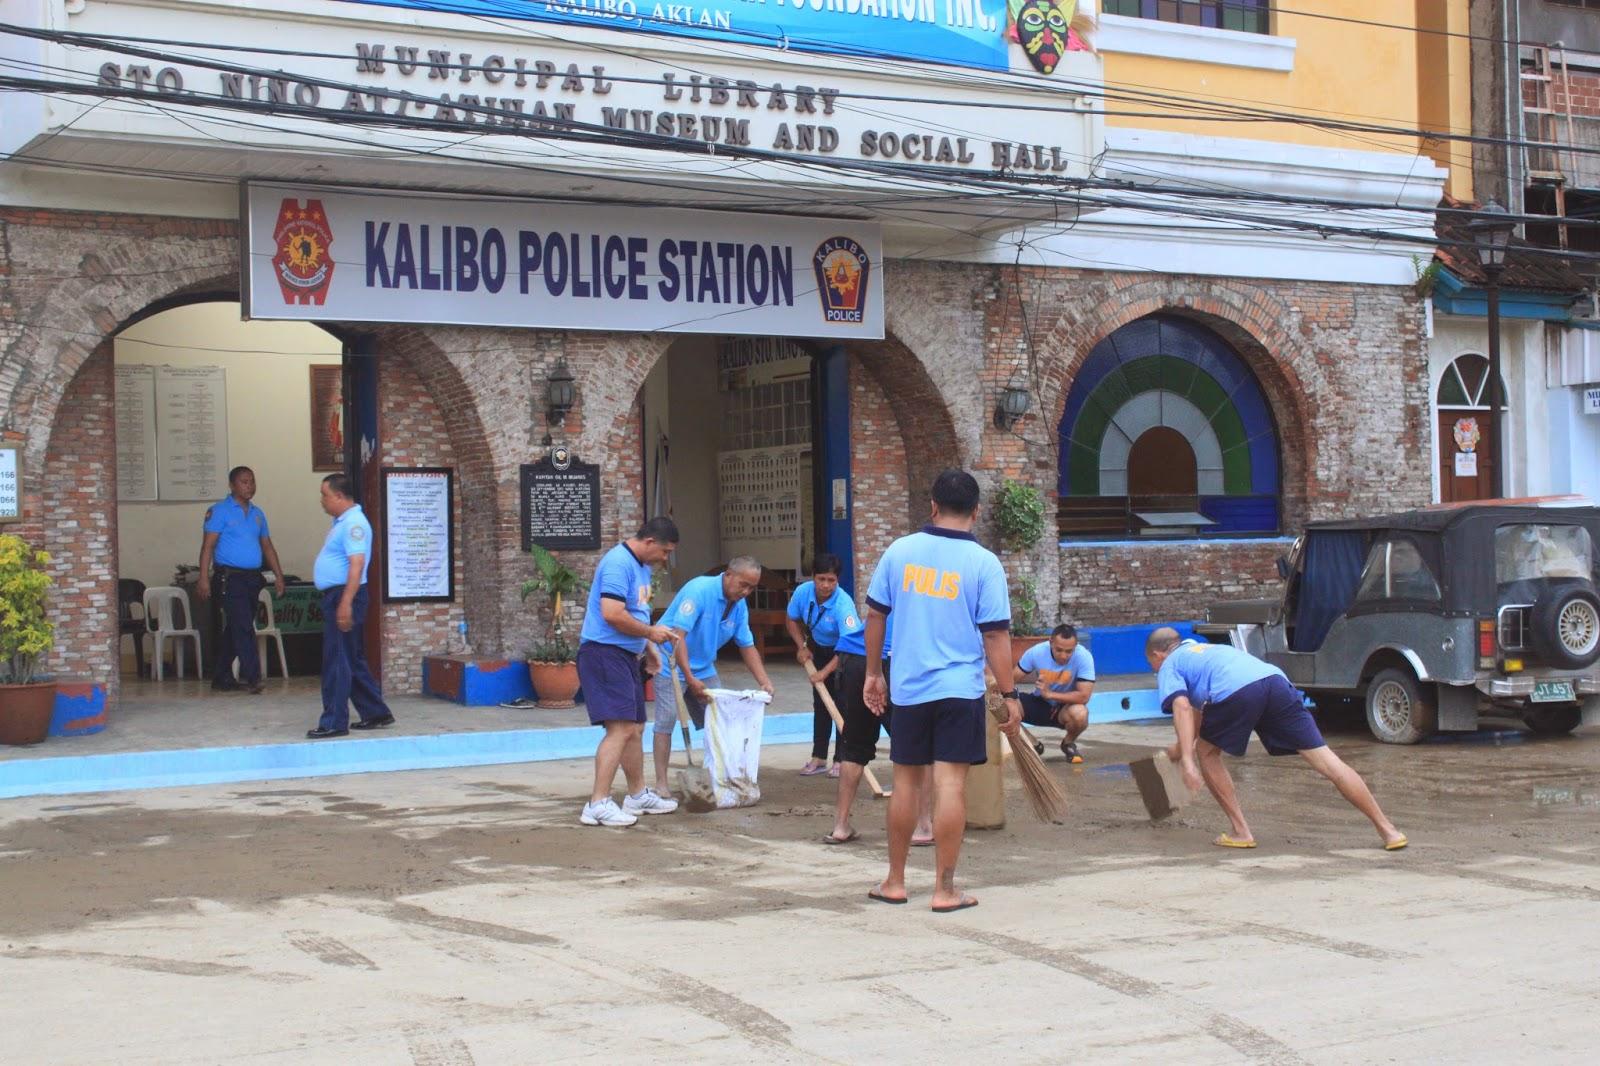 Kasafi donates 2 motorcycles to Kalibo police unit